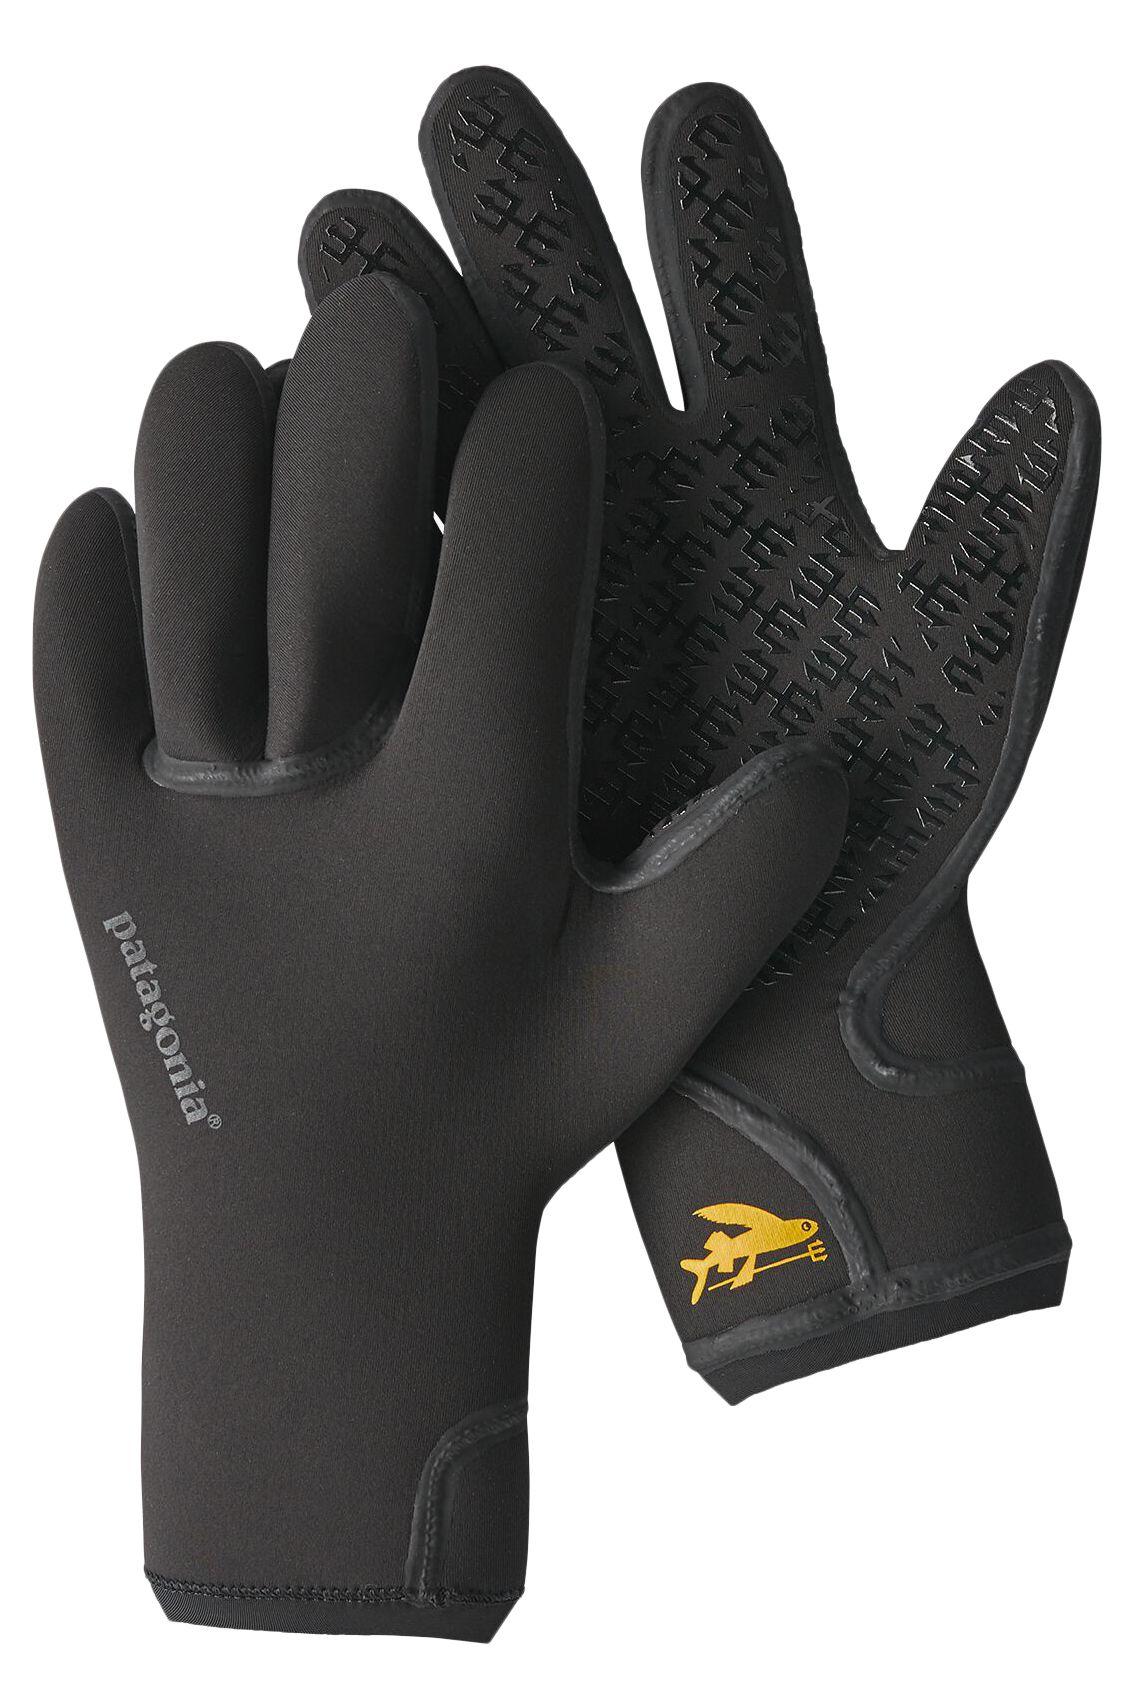 Patagonia Neoprene Gloves R3 YULEX GLOVES Black